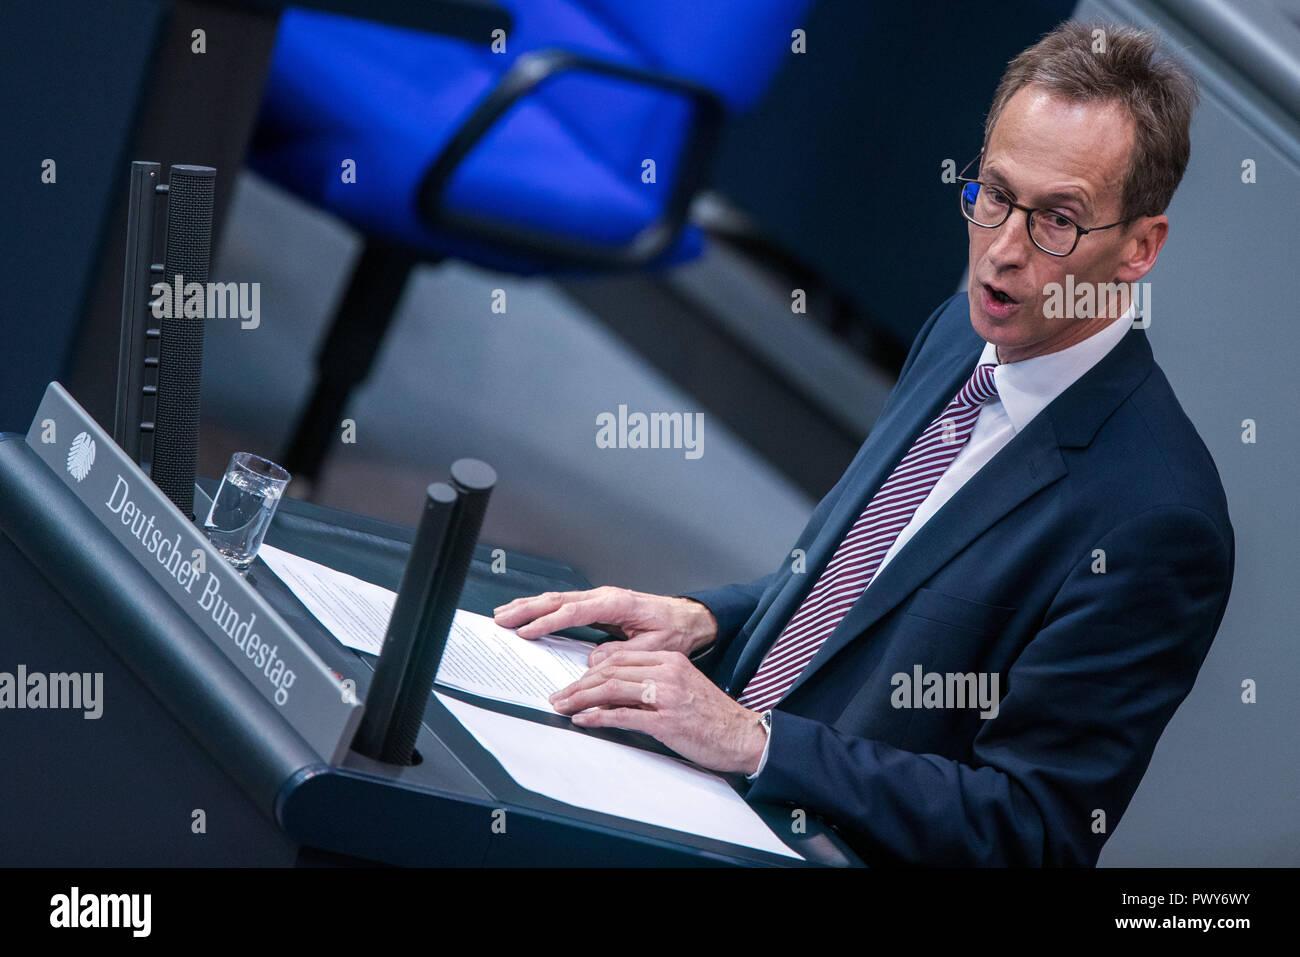 Berlin, Germany. 18th Oct, 2018. Detlef Seif, member of the Bundestag of the CDU/CSU faction, speaks in the Bundestag. Credit: Jens Büttner/dpa-Zentralbild/dpa/Alamy Live News - Stock Image